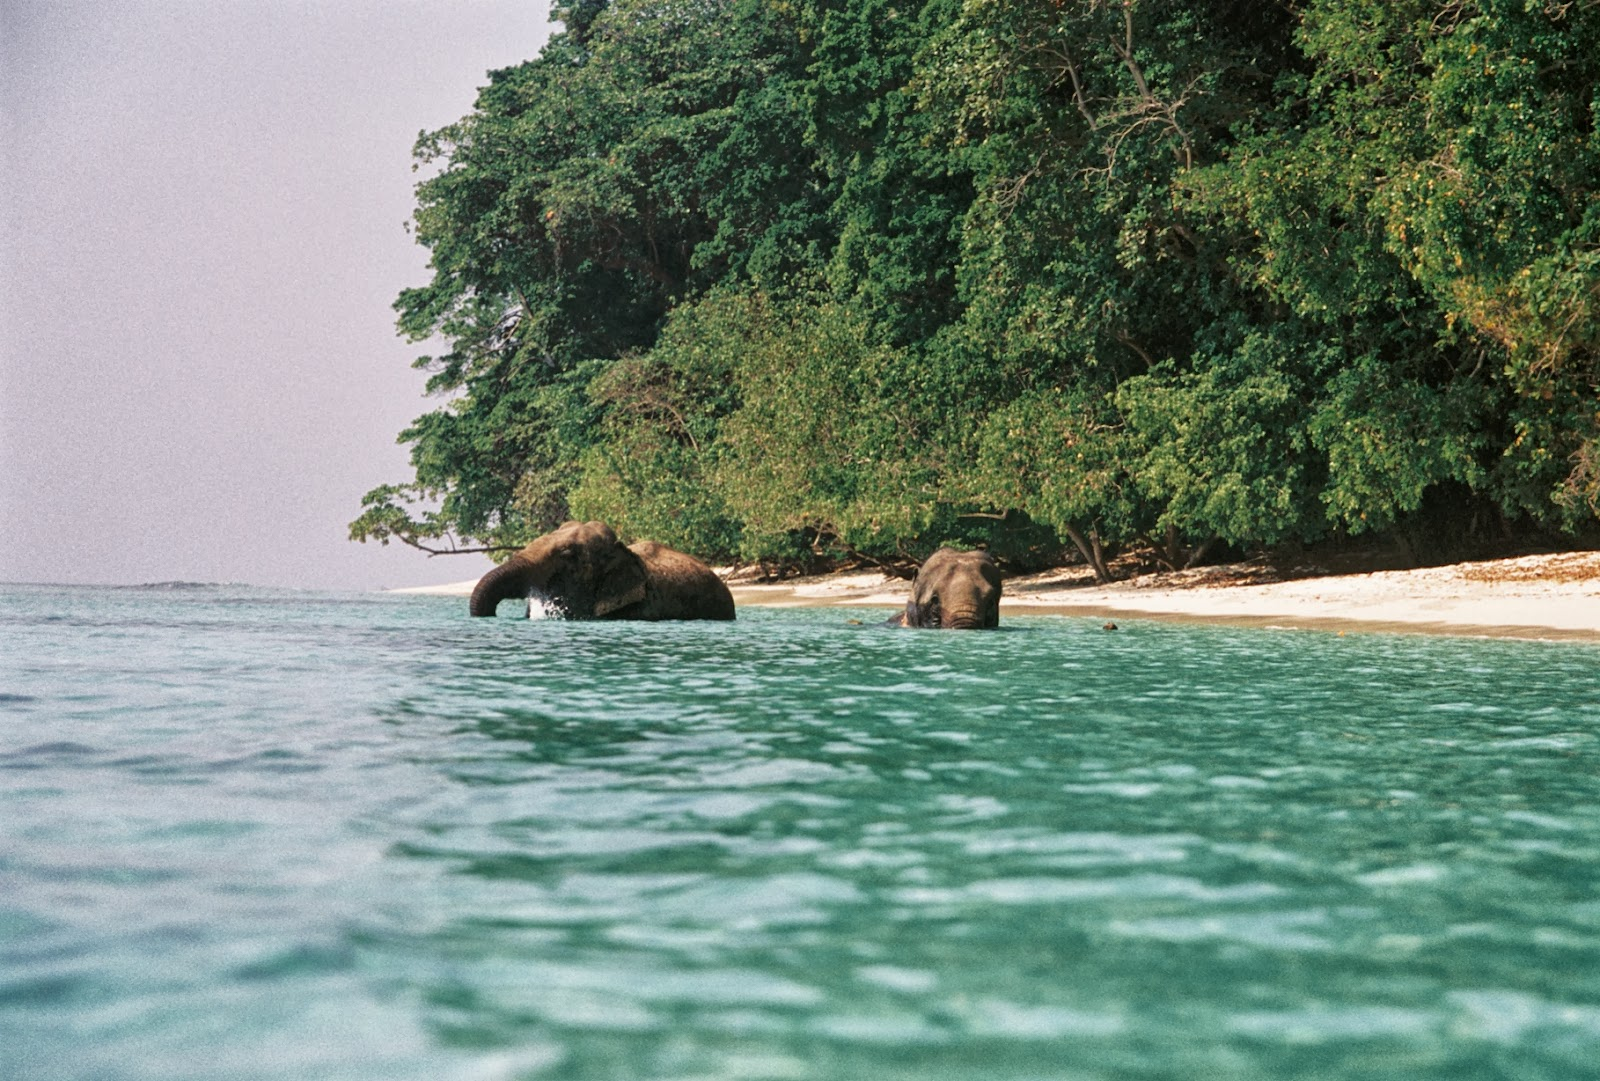 Andaman and Nicobar Islan India  city photos gallery : andaman and nicobar island a relaxed tropical island andaman and